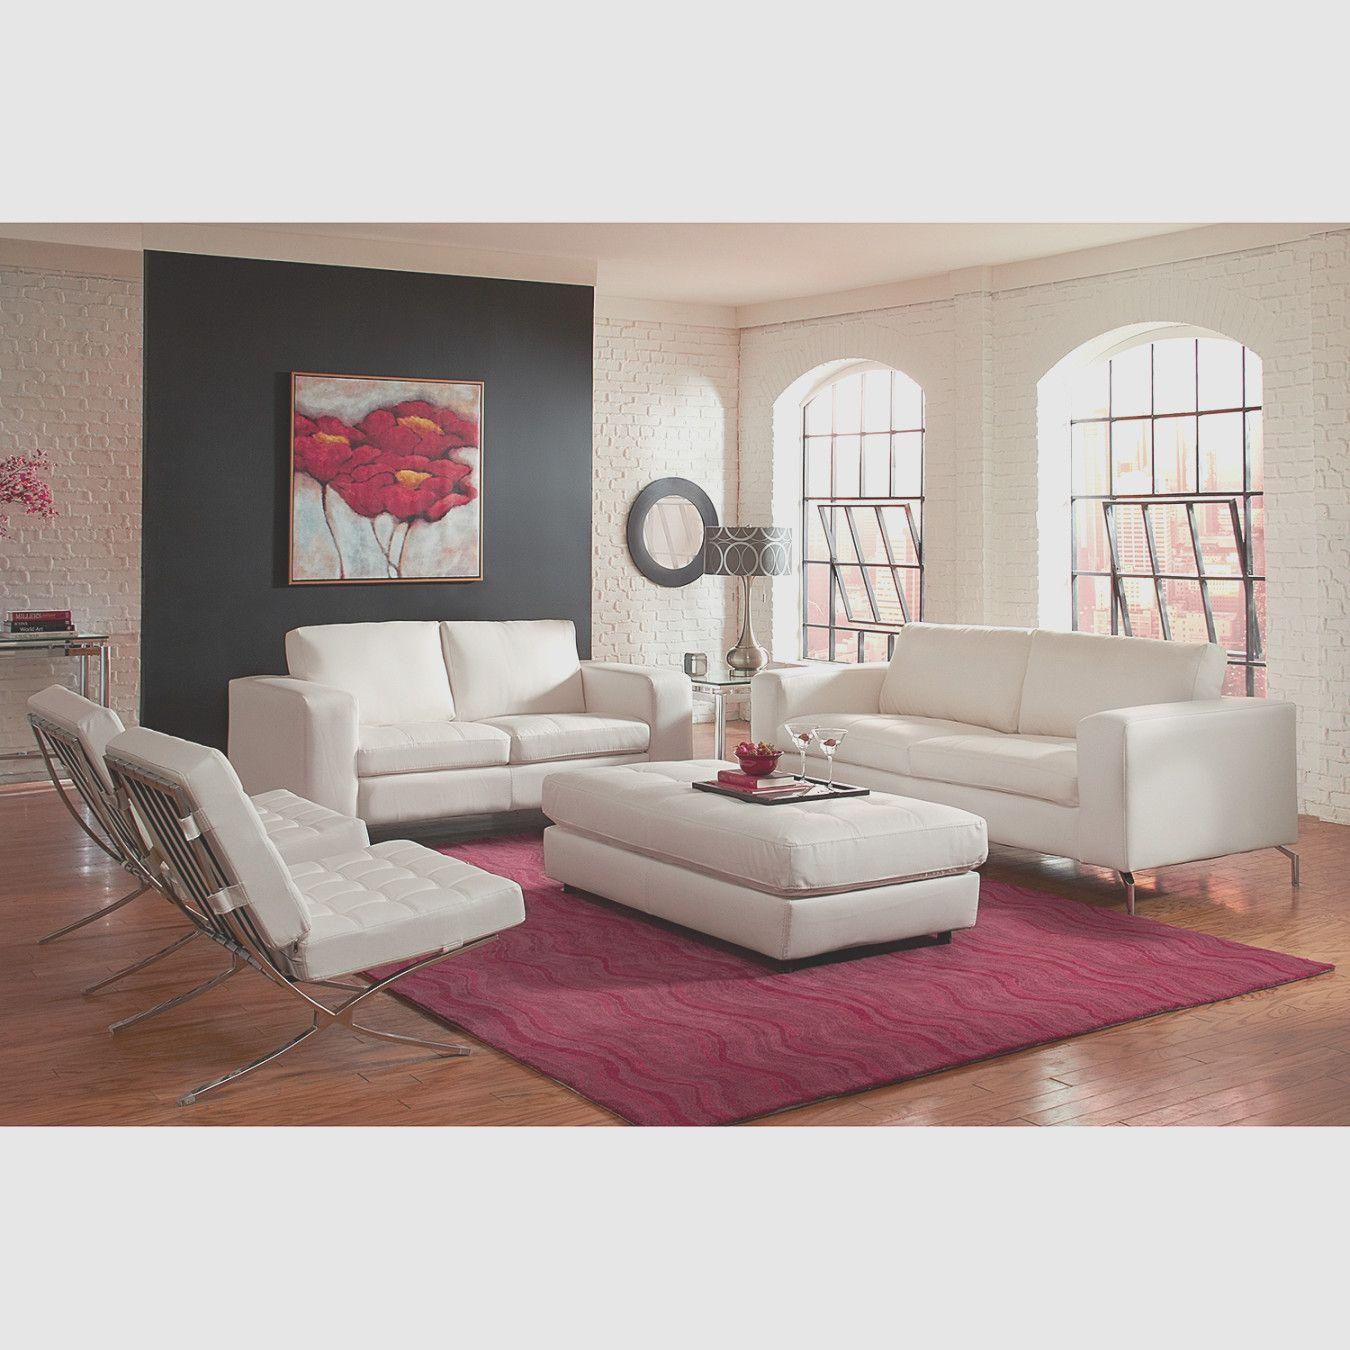 Value City Sofas Value City Furniture Furniture Sofa